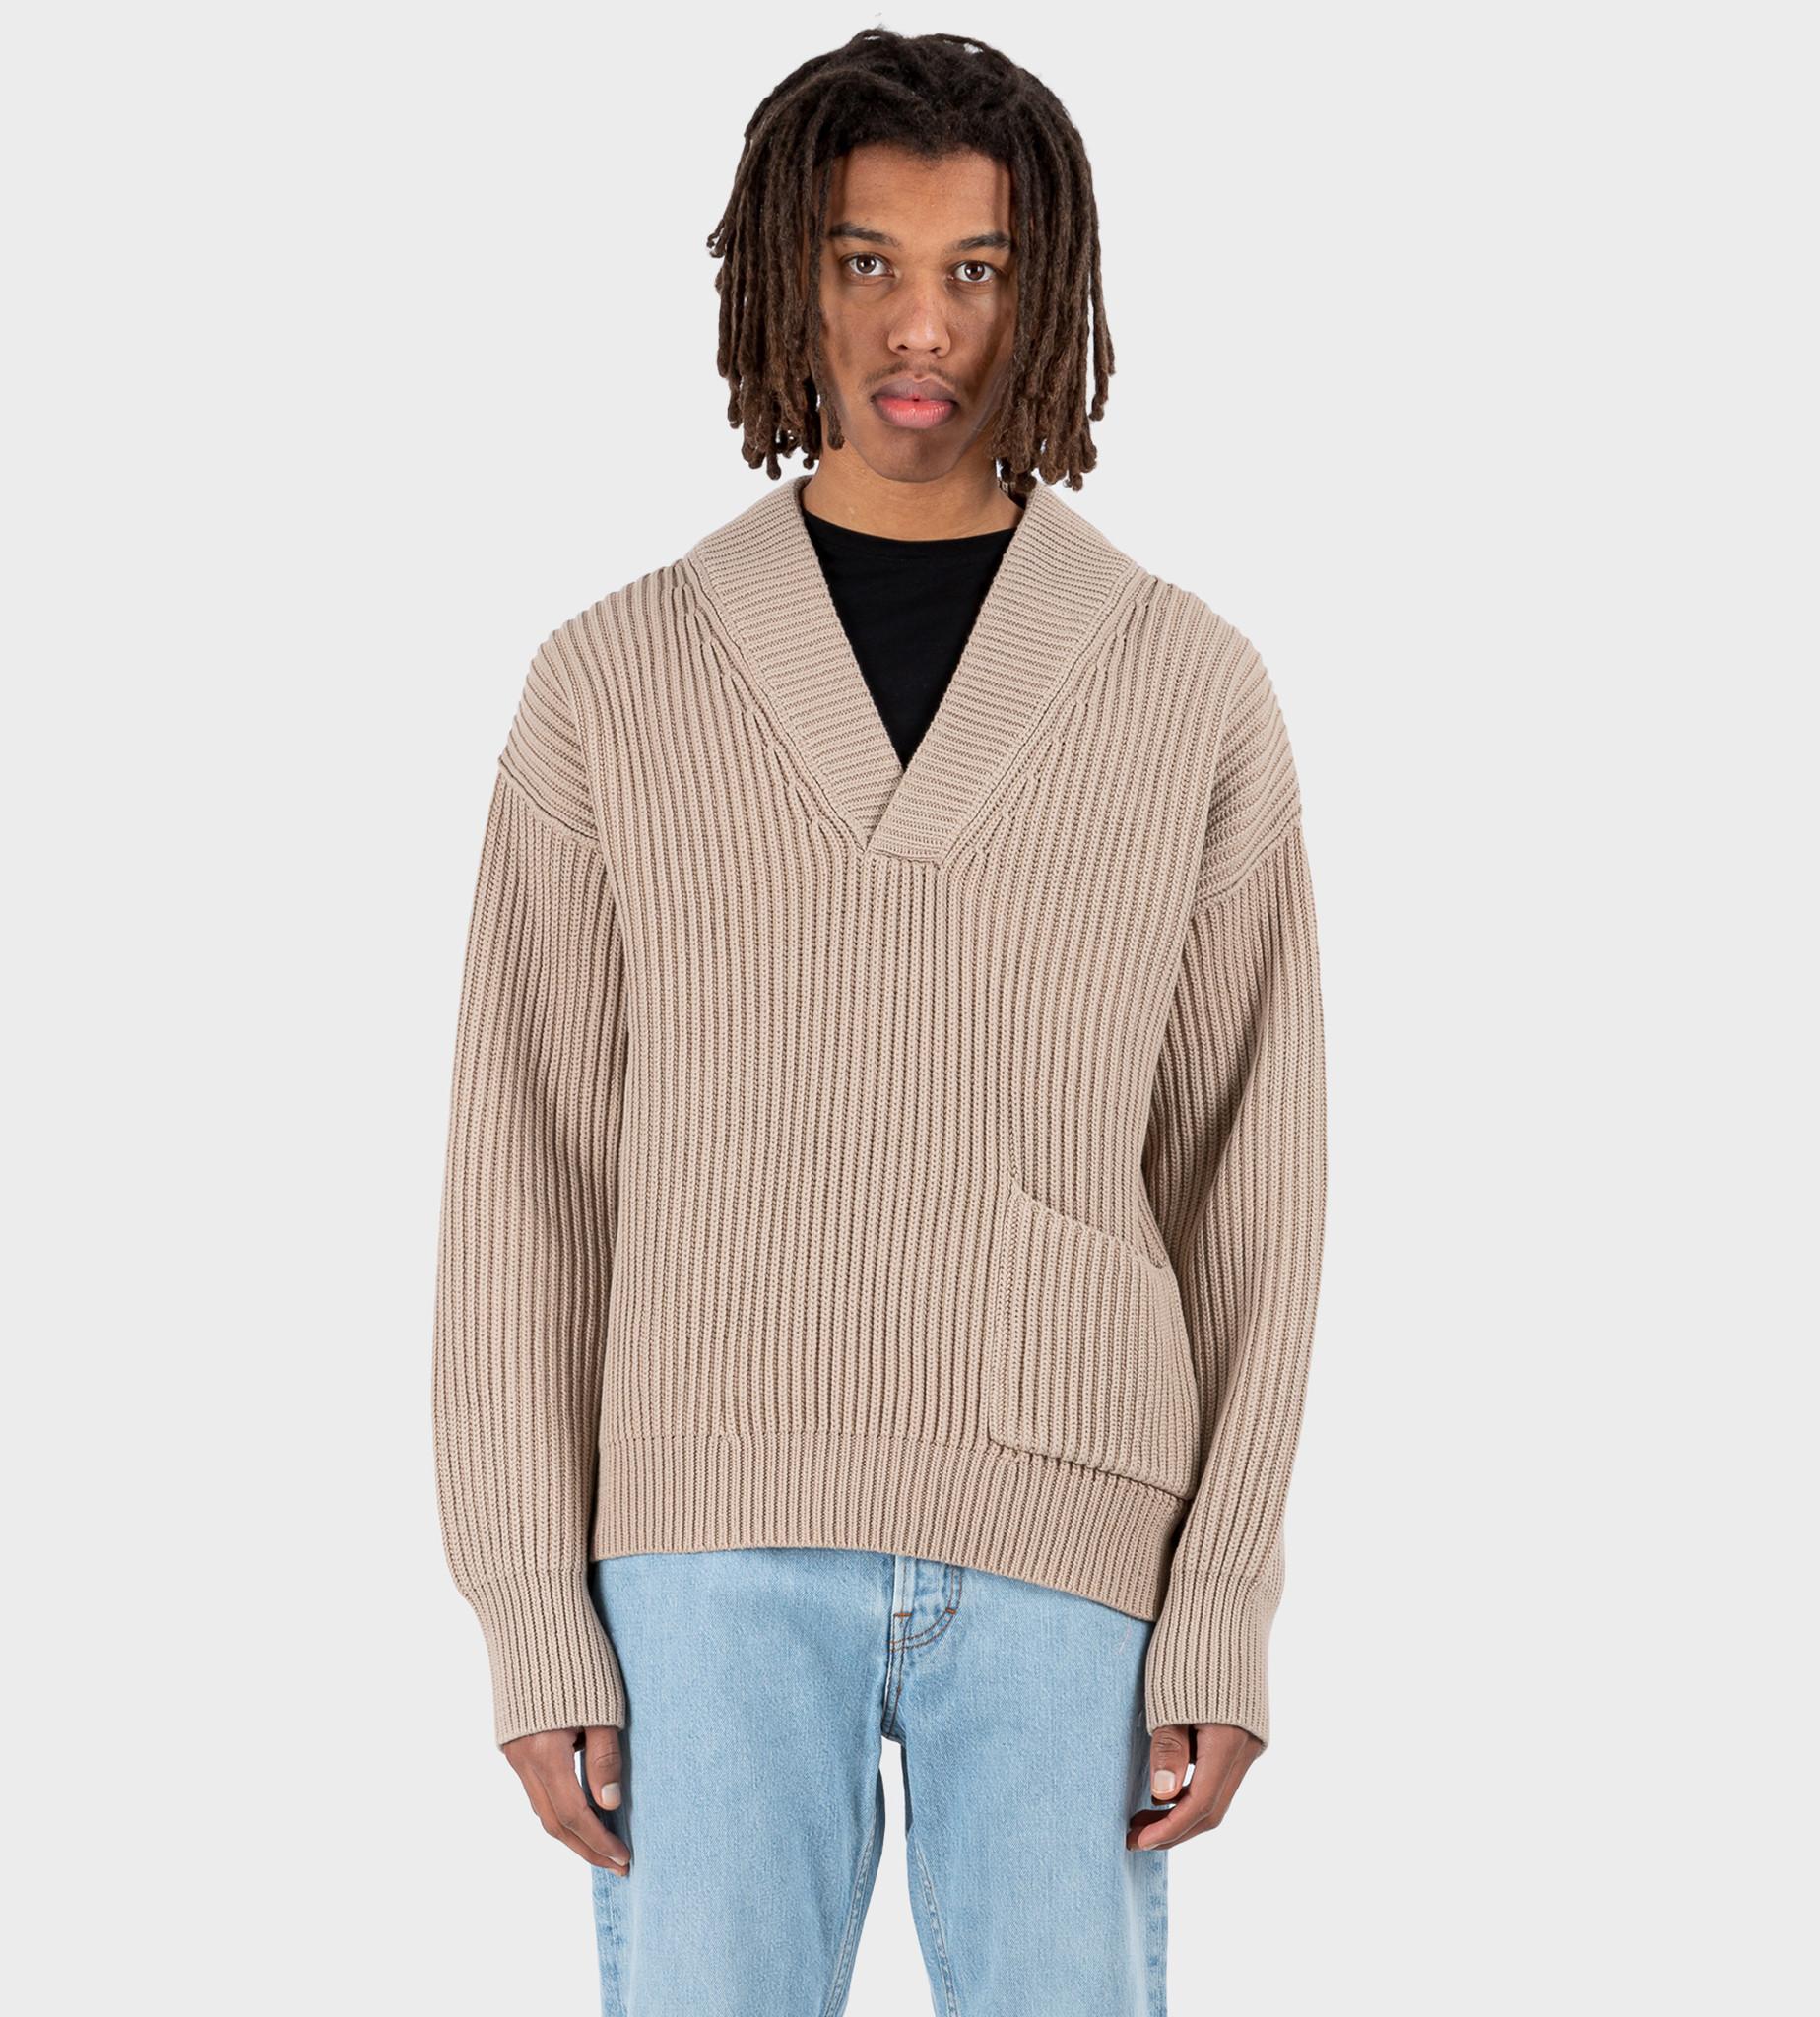 ACNE STUDIOS Mixed Rib Sweater Hazel Beige